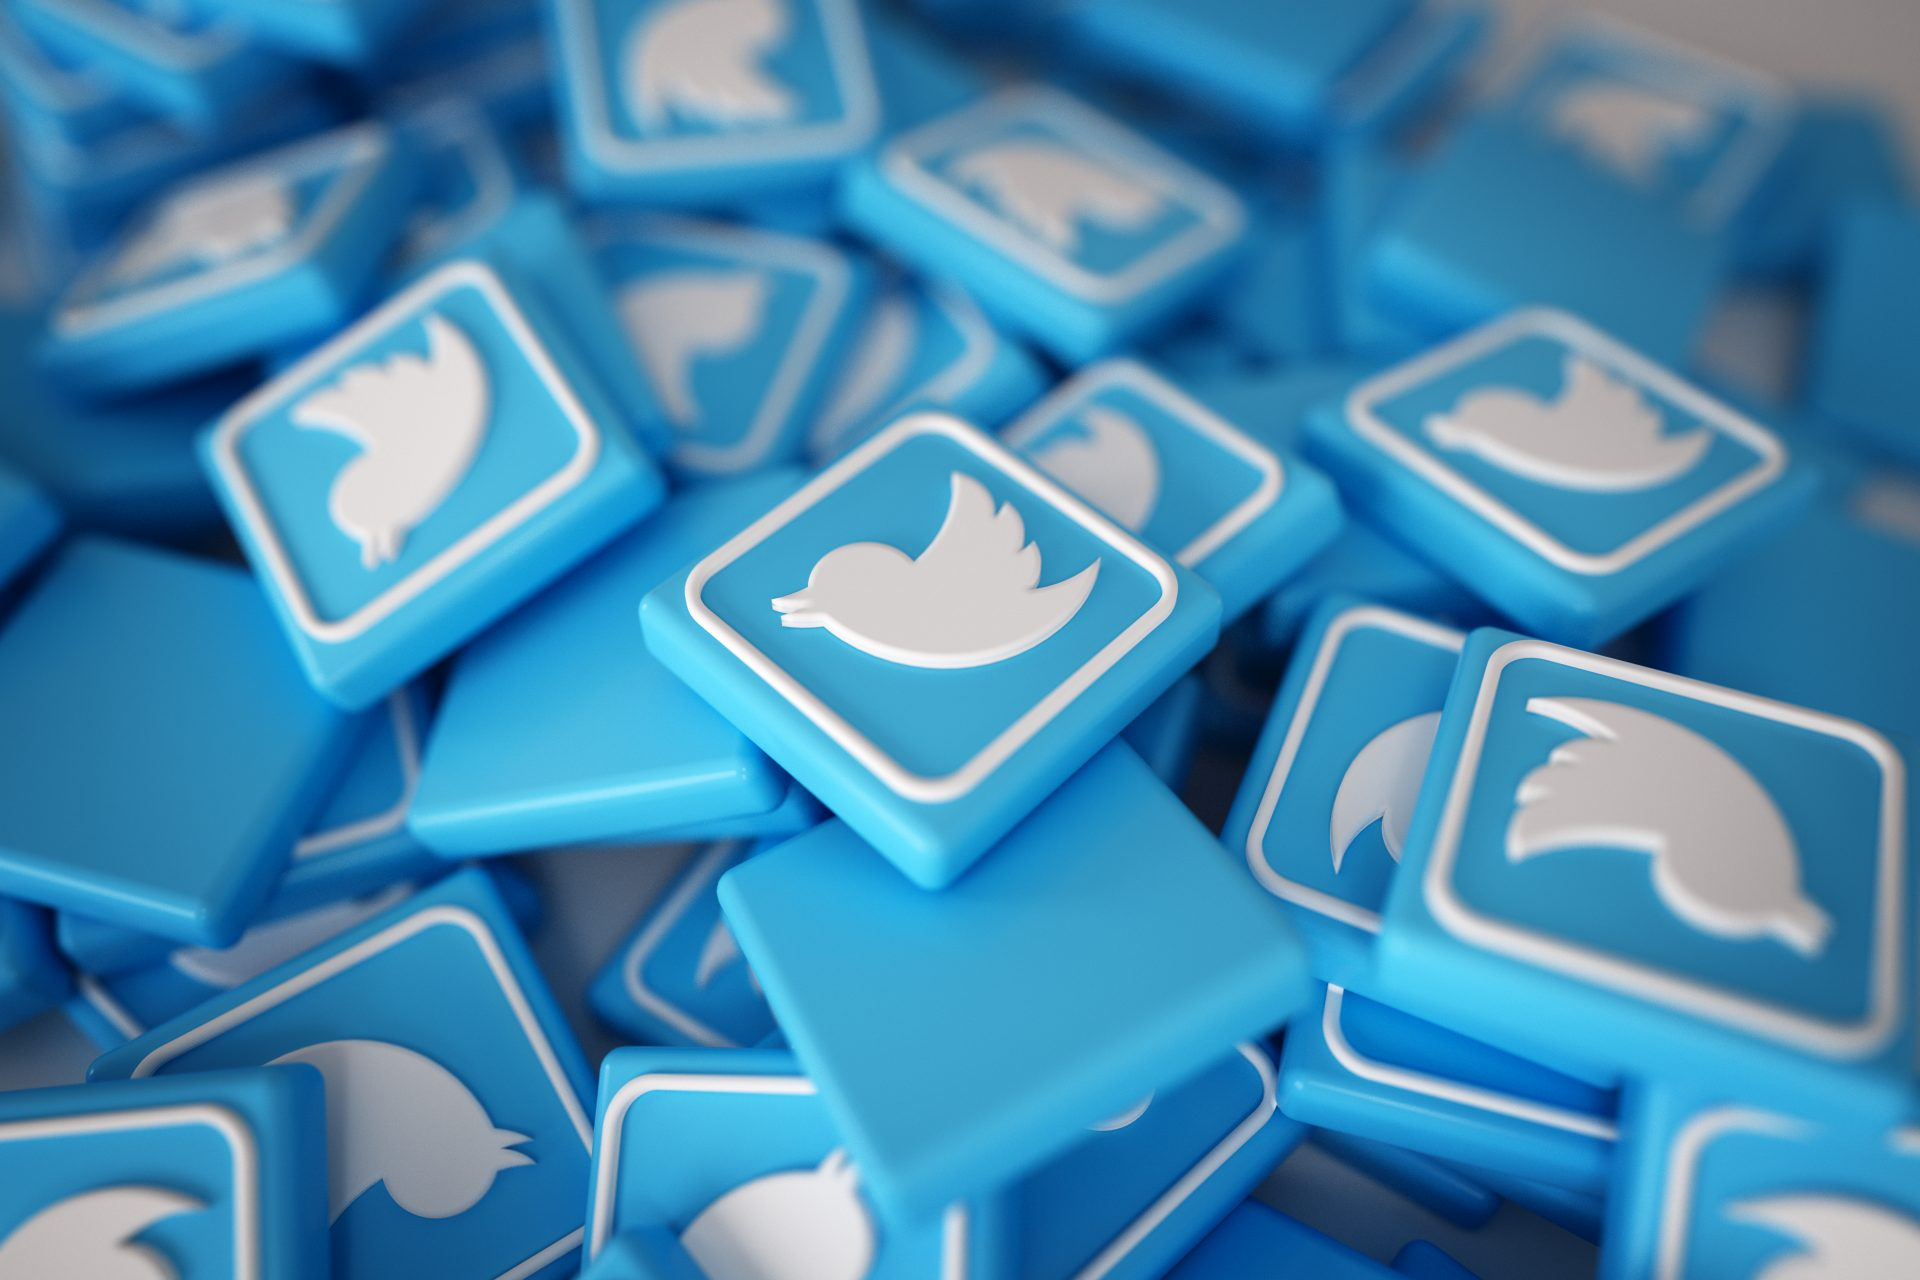 Twitterアイコン大量